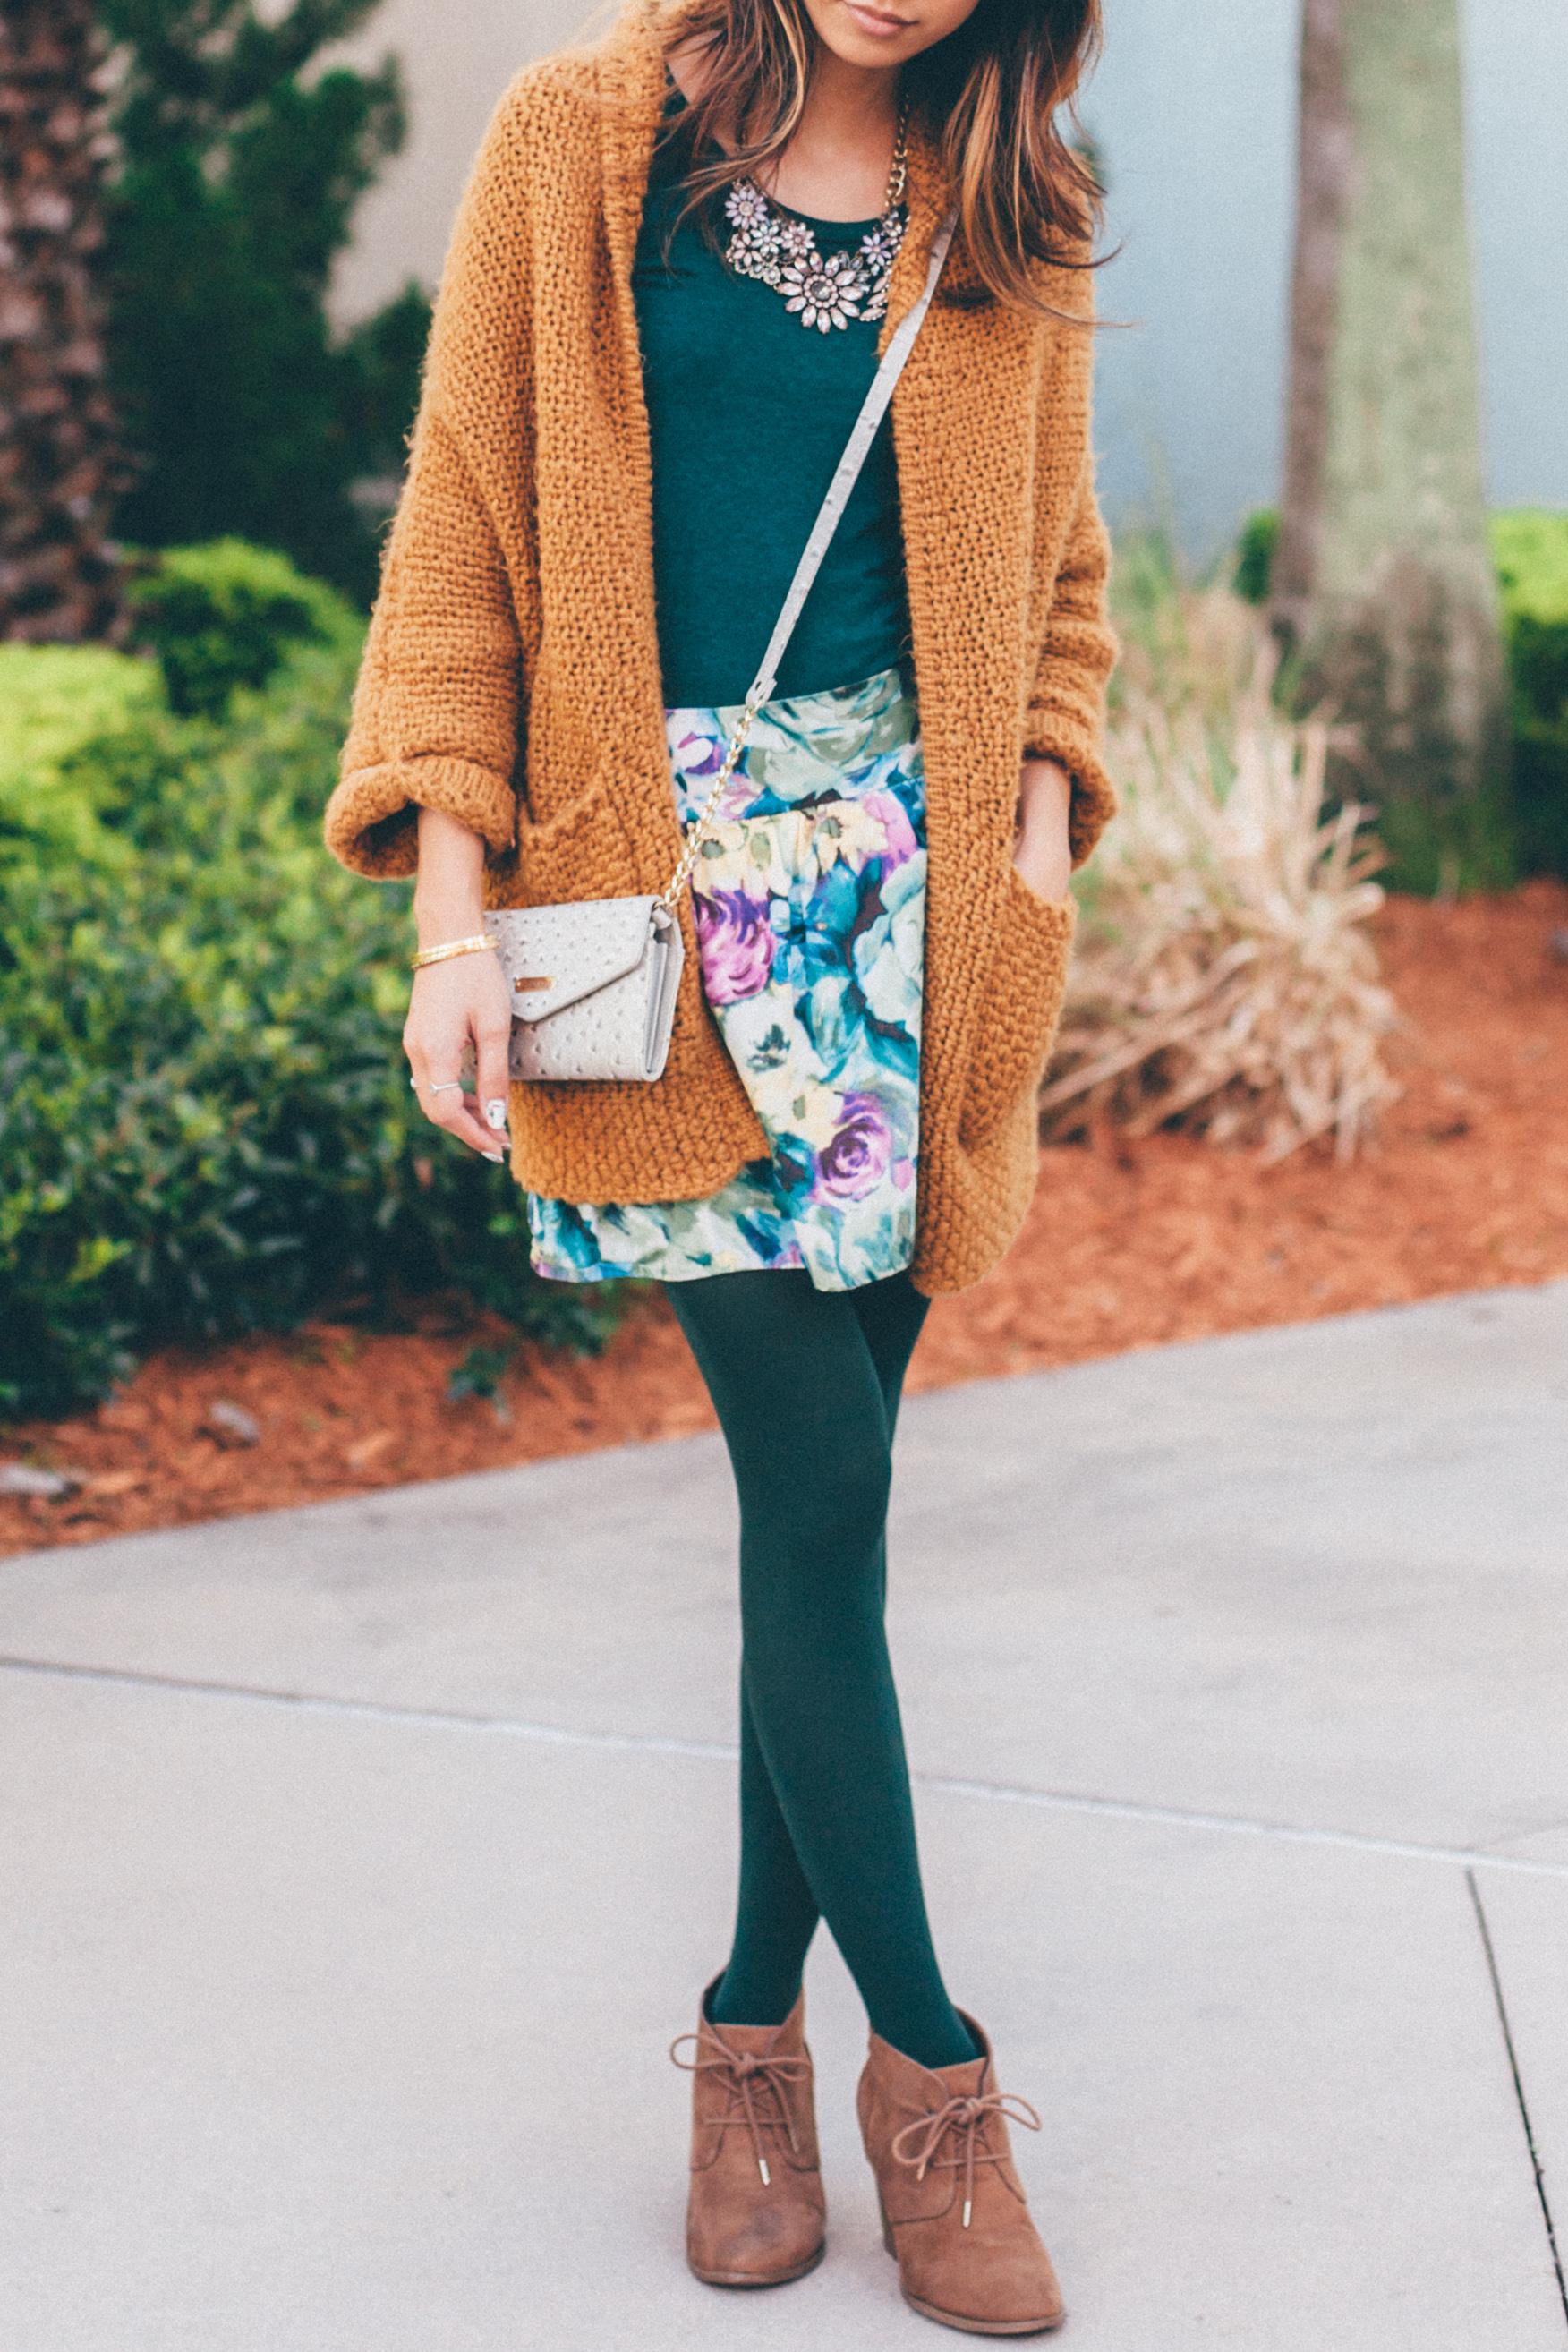 This Jenn Girl - Shein Sweater 2